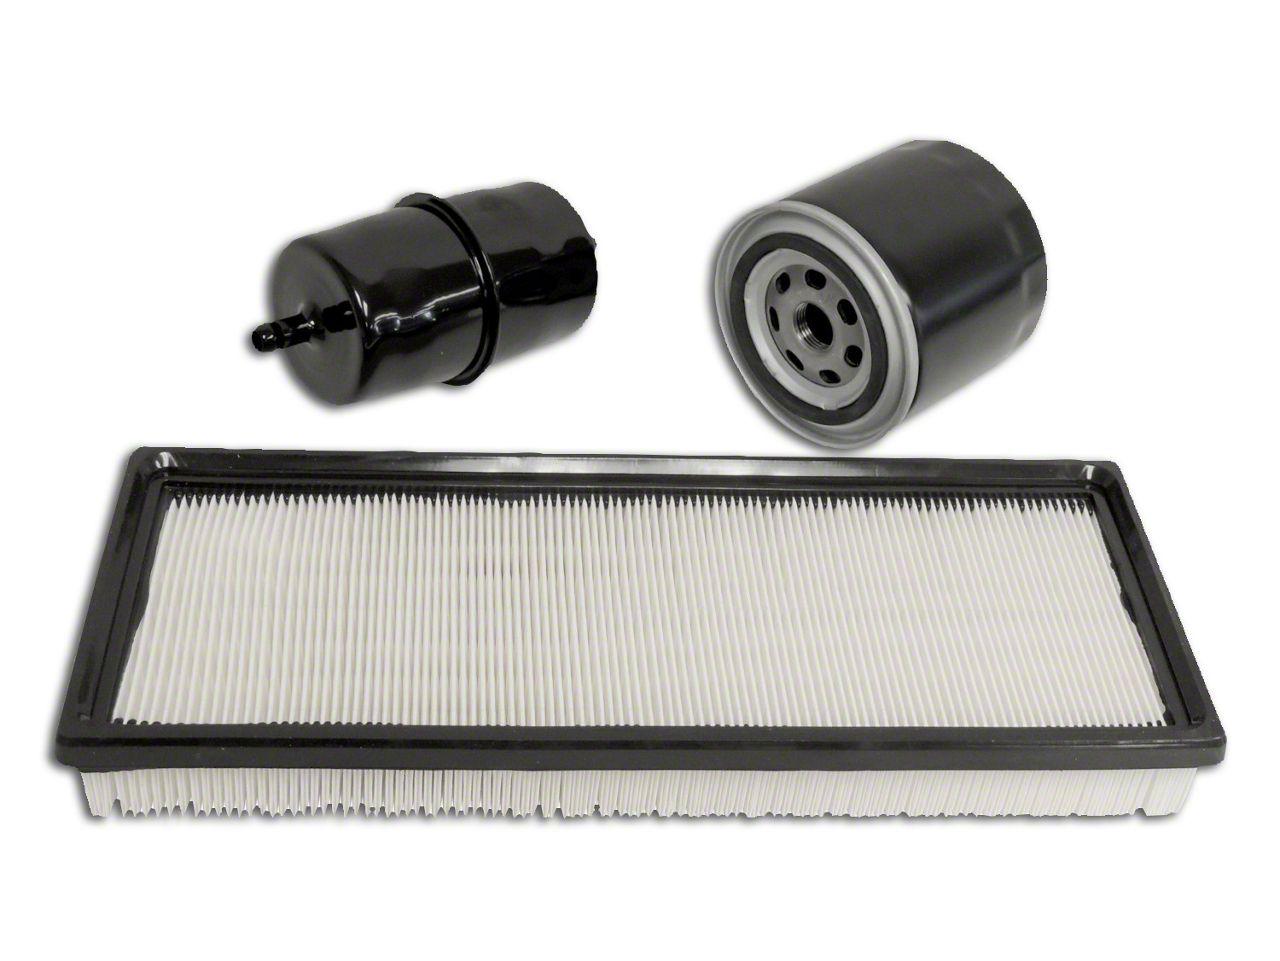 Crown Automotive Master Filter Kit (91-95 2.5L or 4.0L Jeep Wrangler YJ)